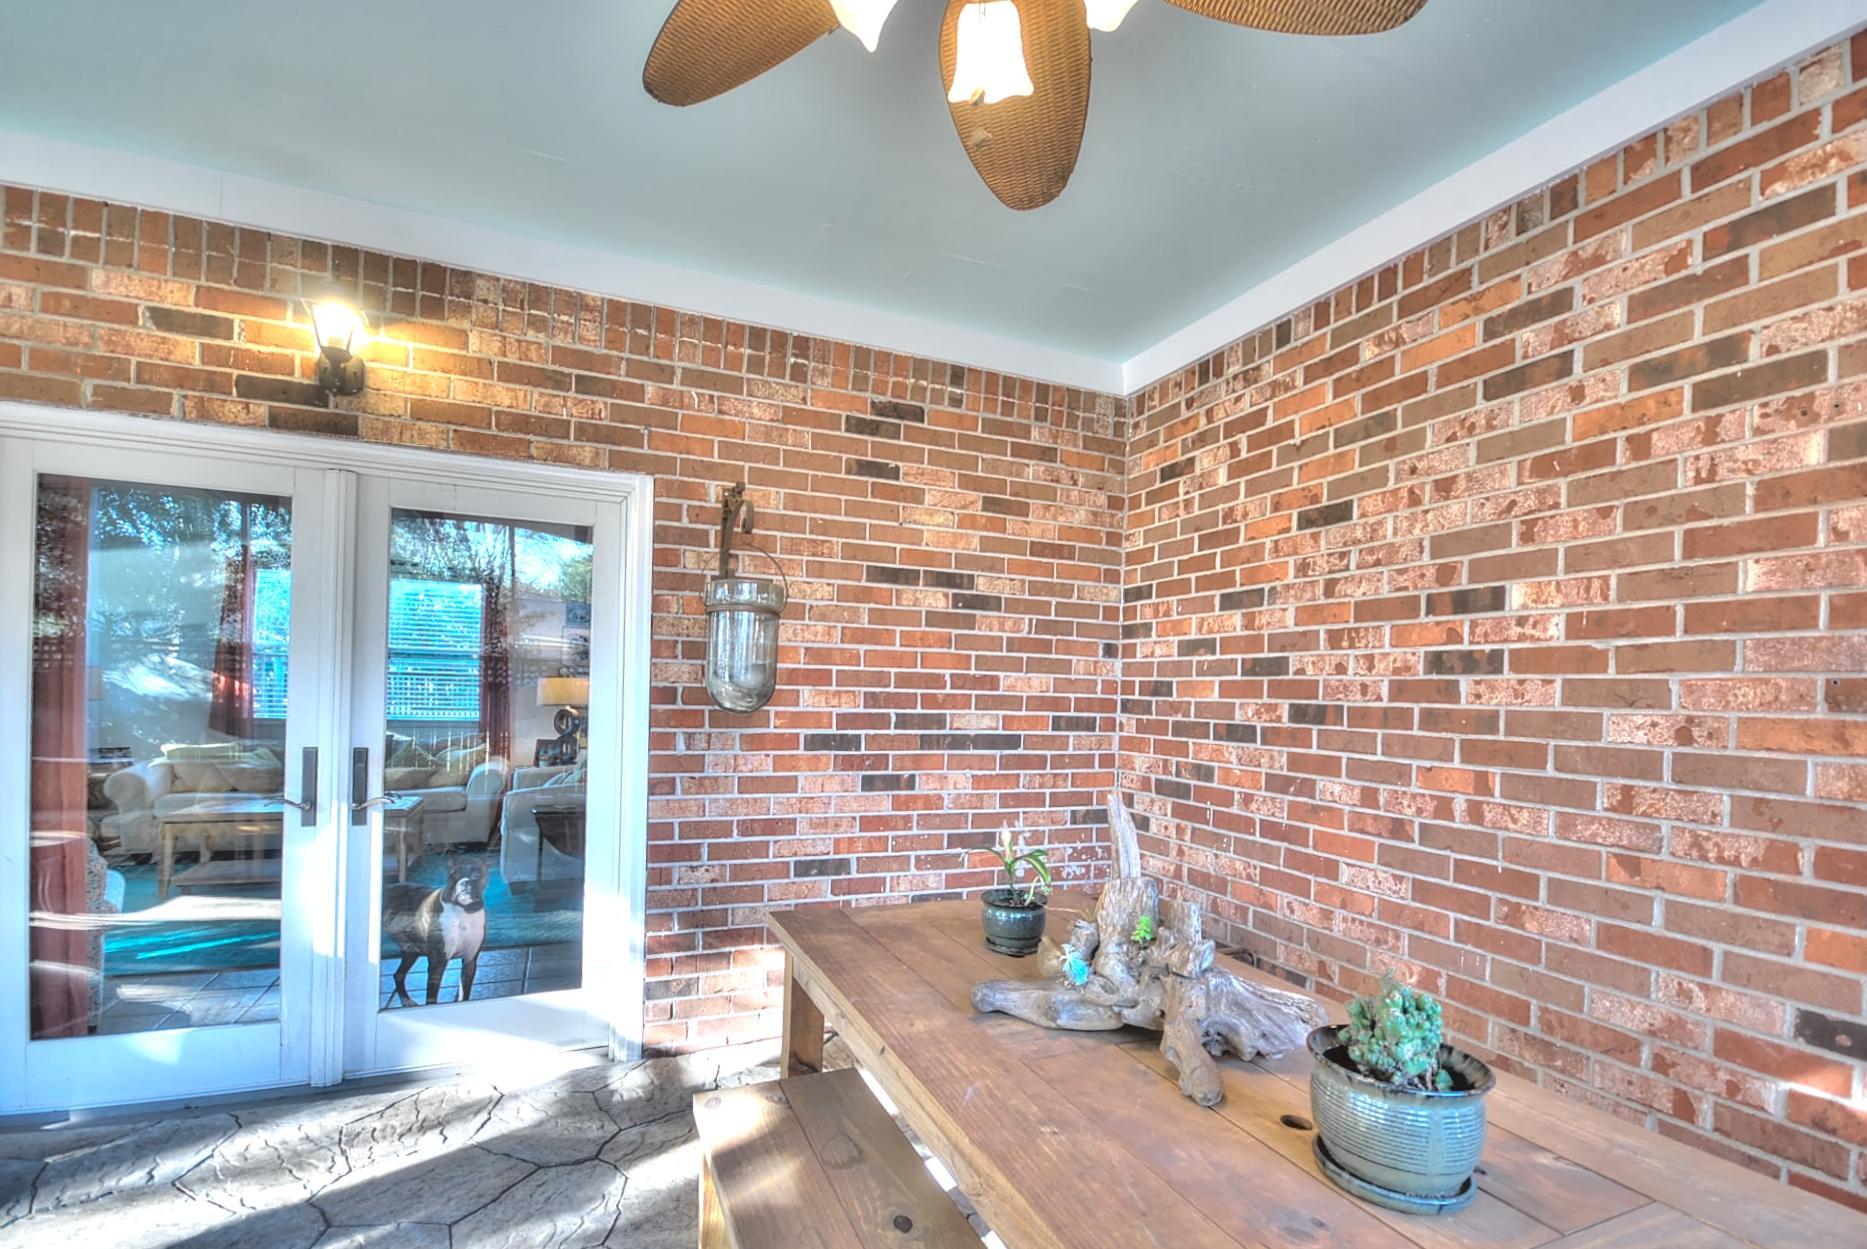 Capri Isles Homes For Sale - 213 Wappoo, Charleston, SC - 20